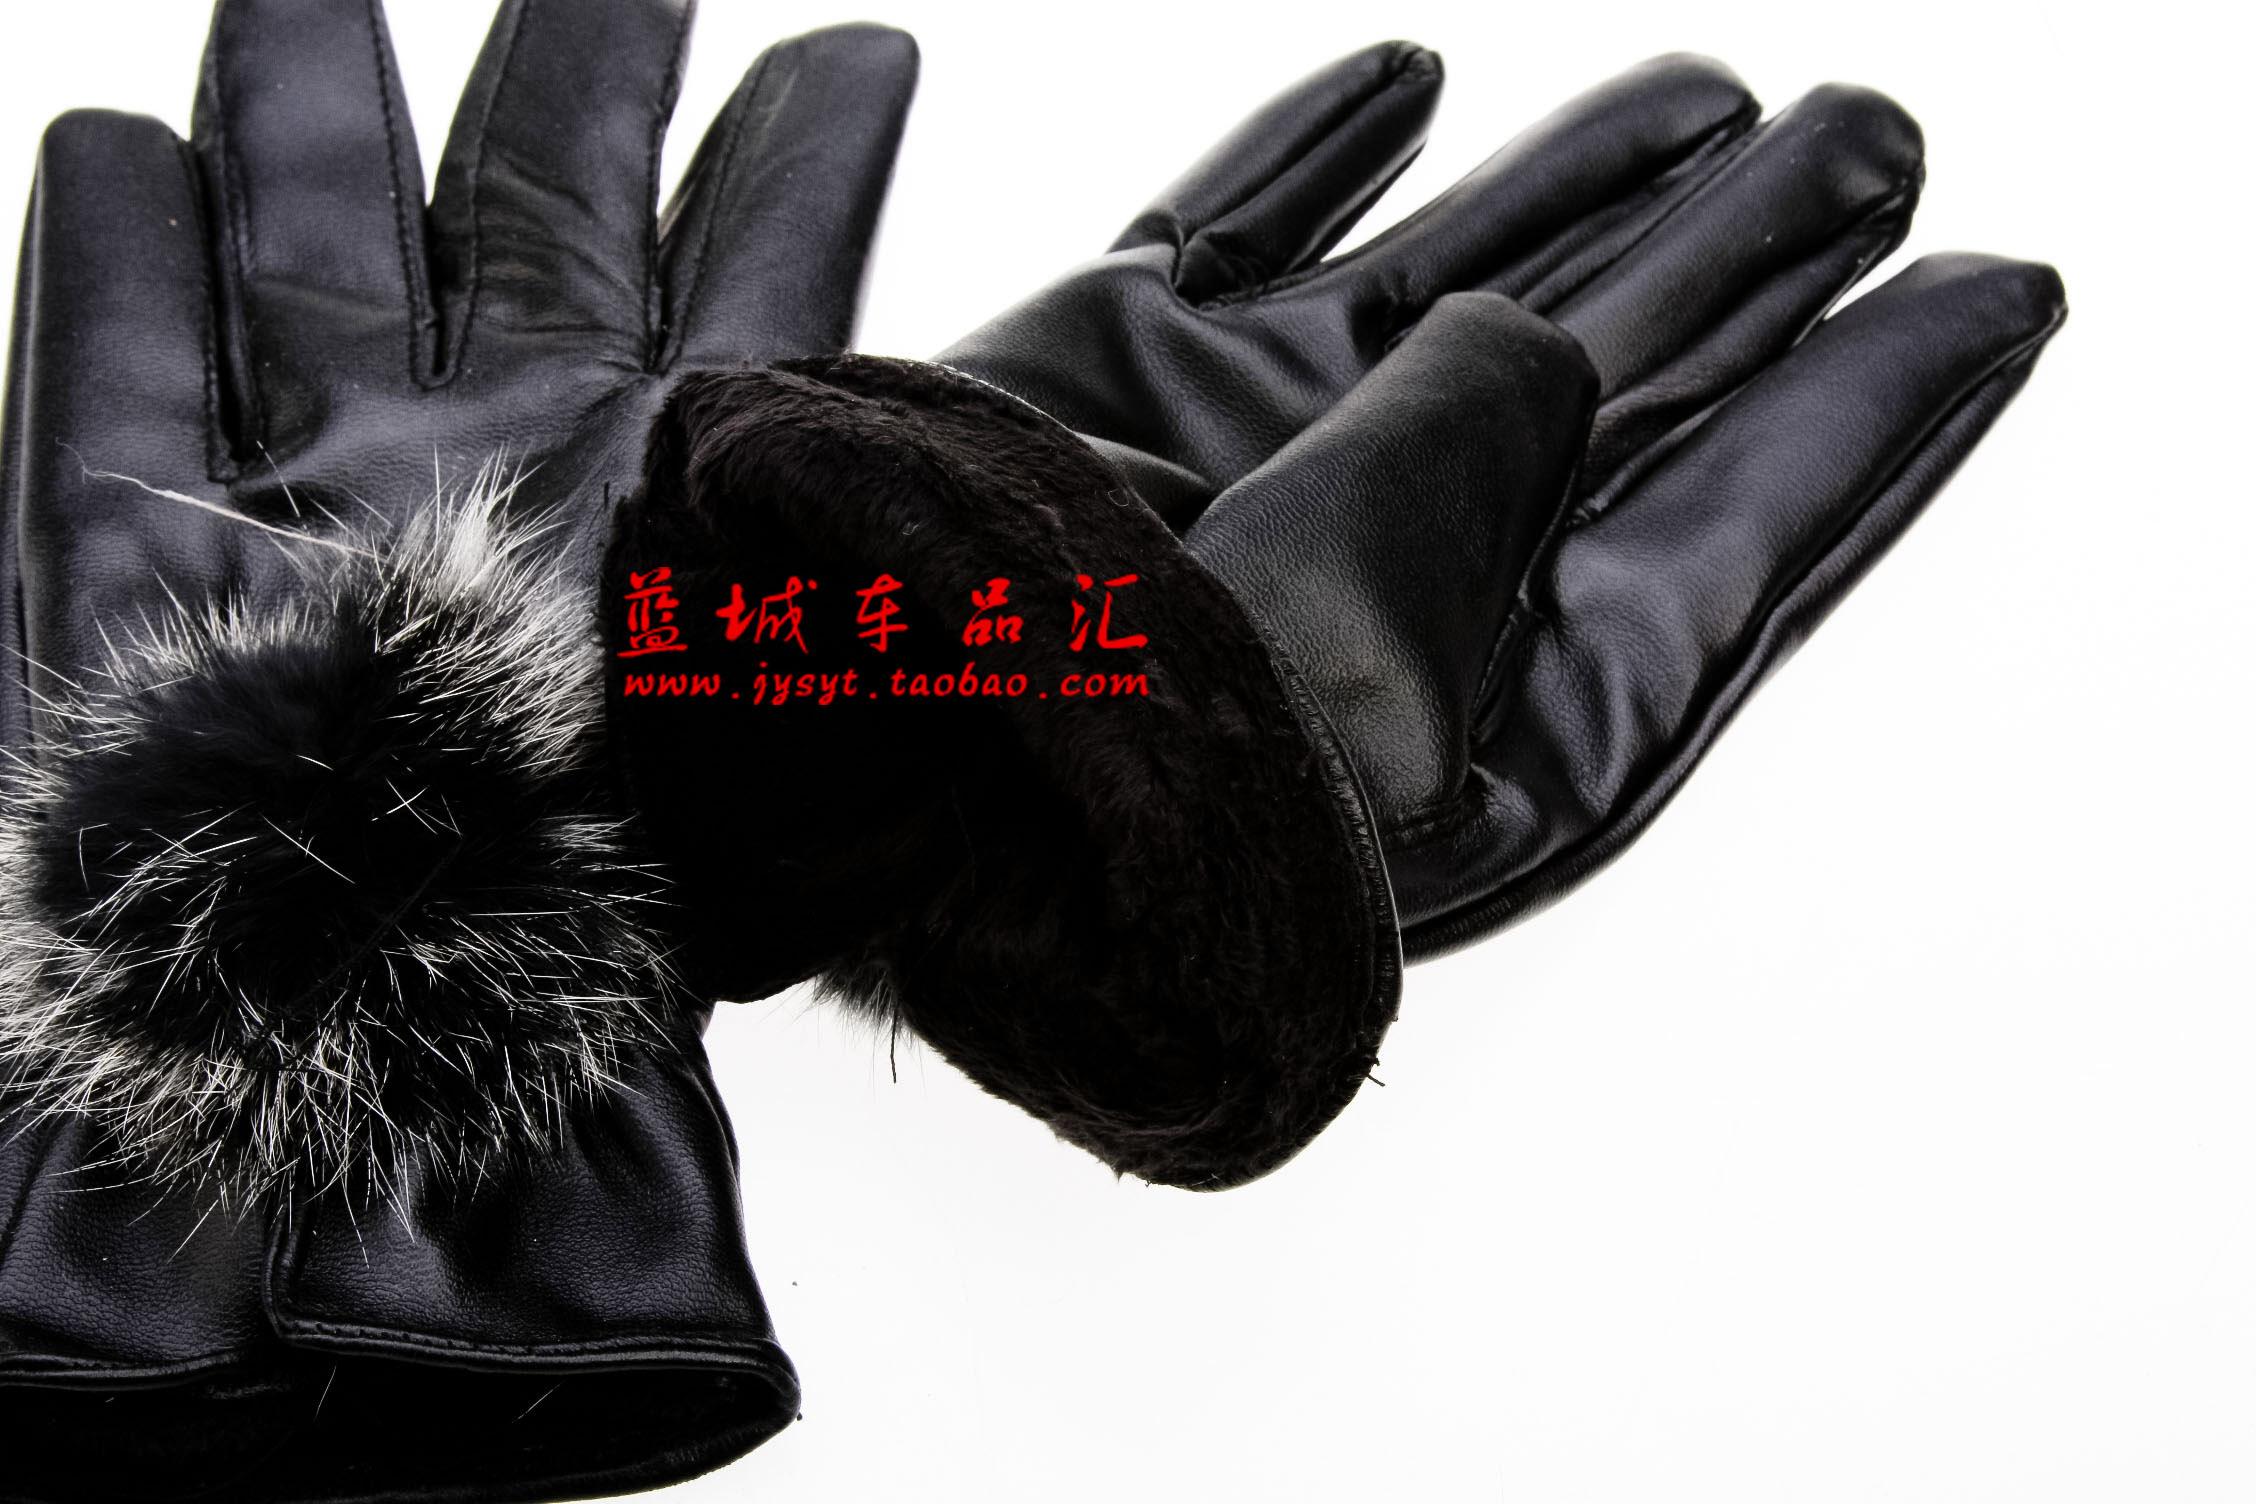 Перчатки для туризма и кемпинга Dragon forest 2013 Dragon forest